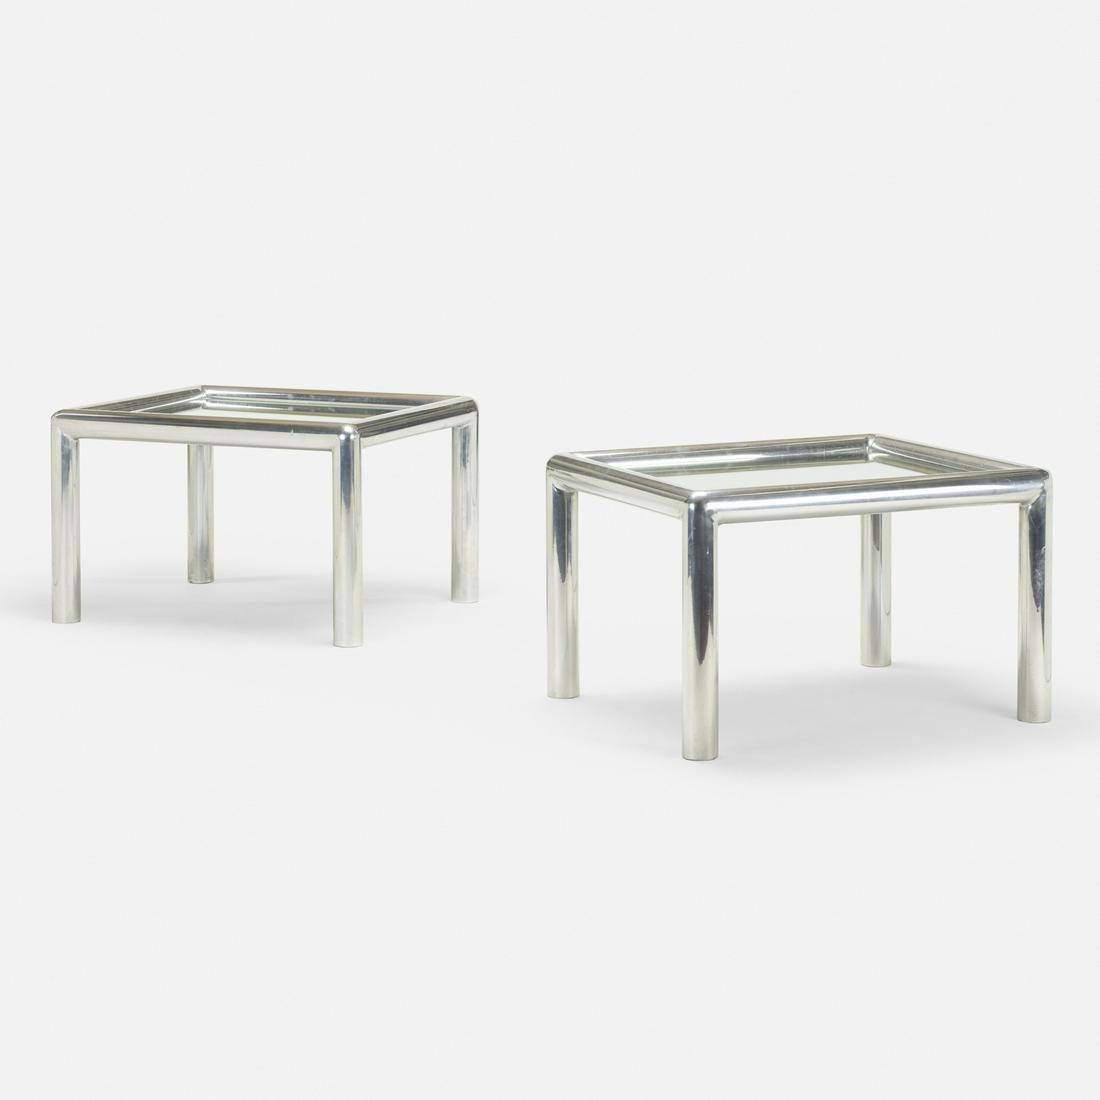 John Mascheroni, Tubo occasional tables, pair